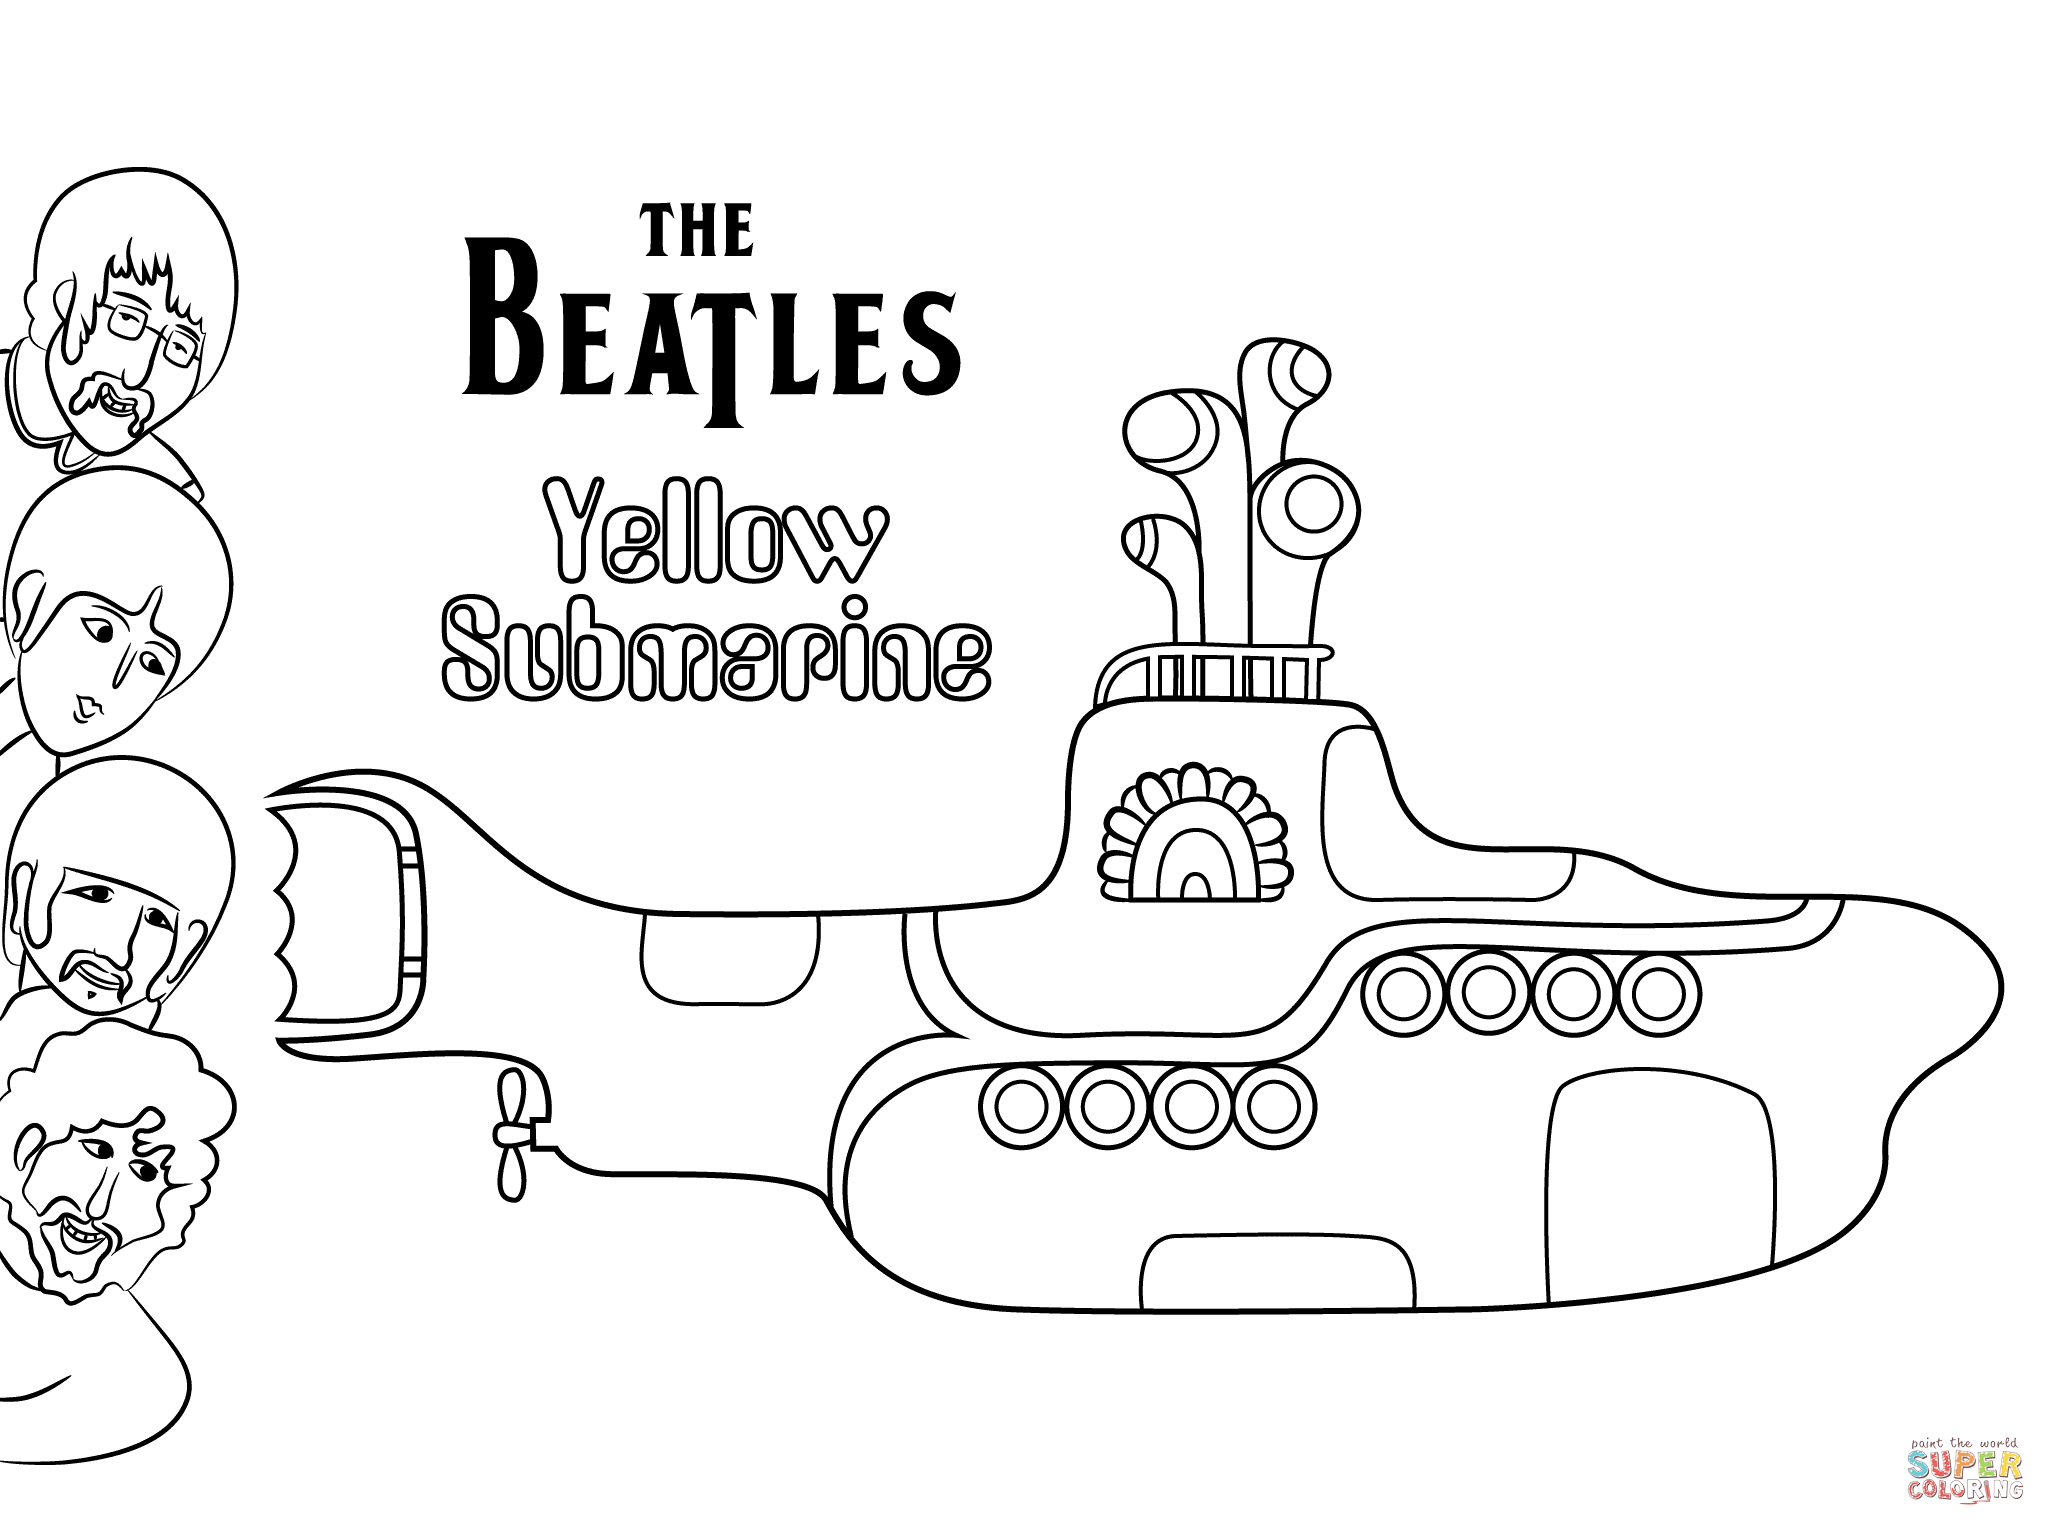 the beatles yellow submarine cover art coloring page free - Submarine Coloring Pages Print